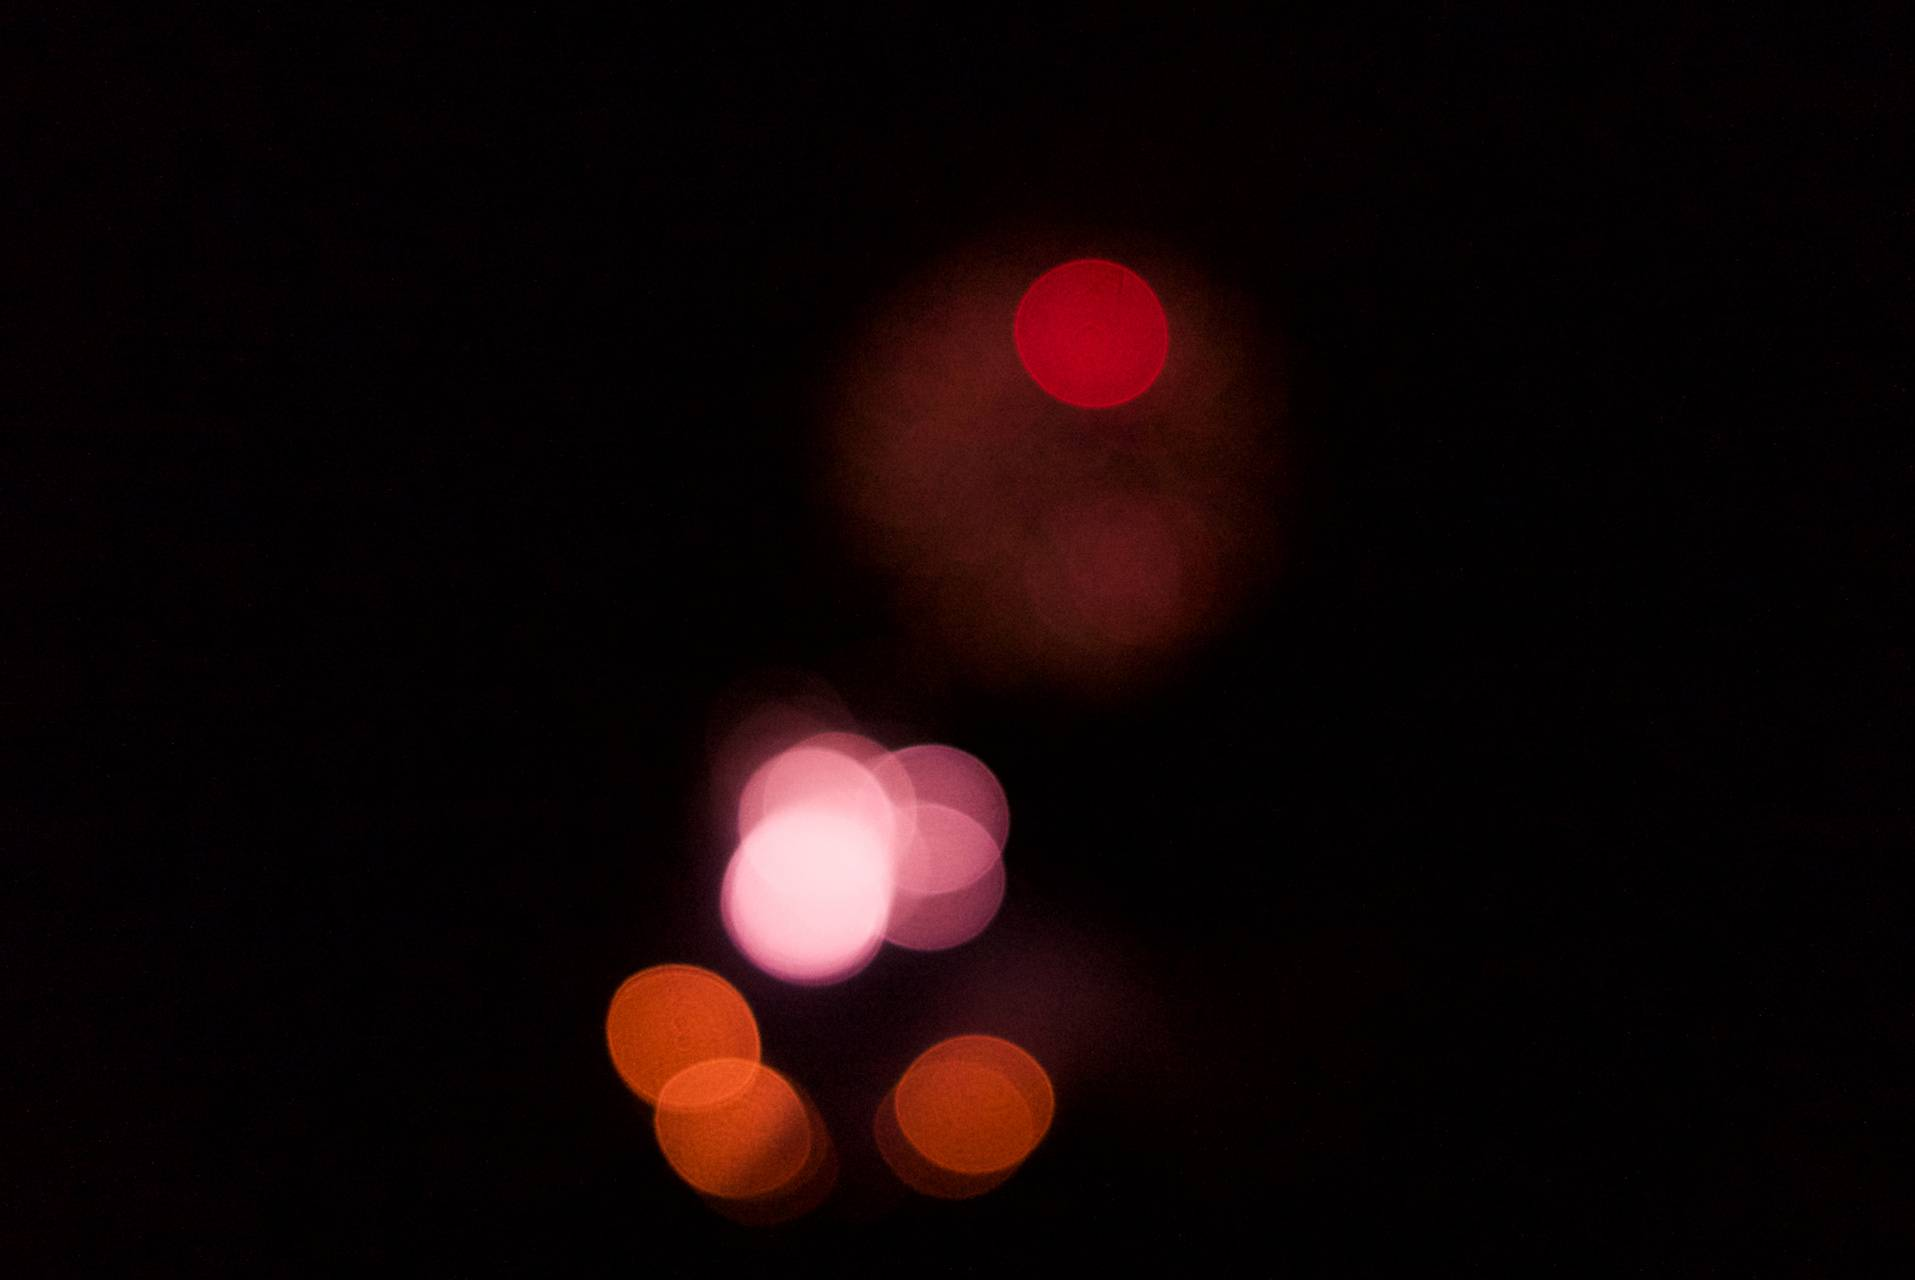 Blury Red Orange FW